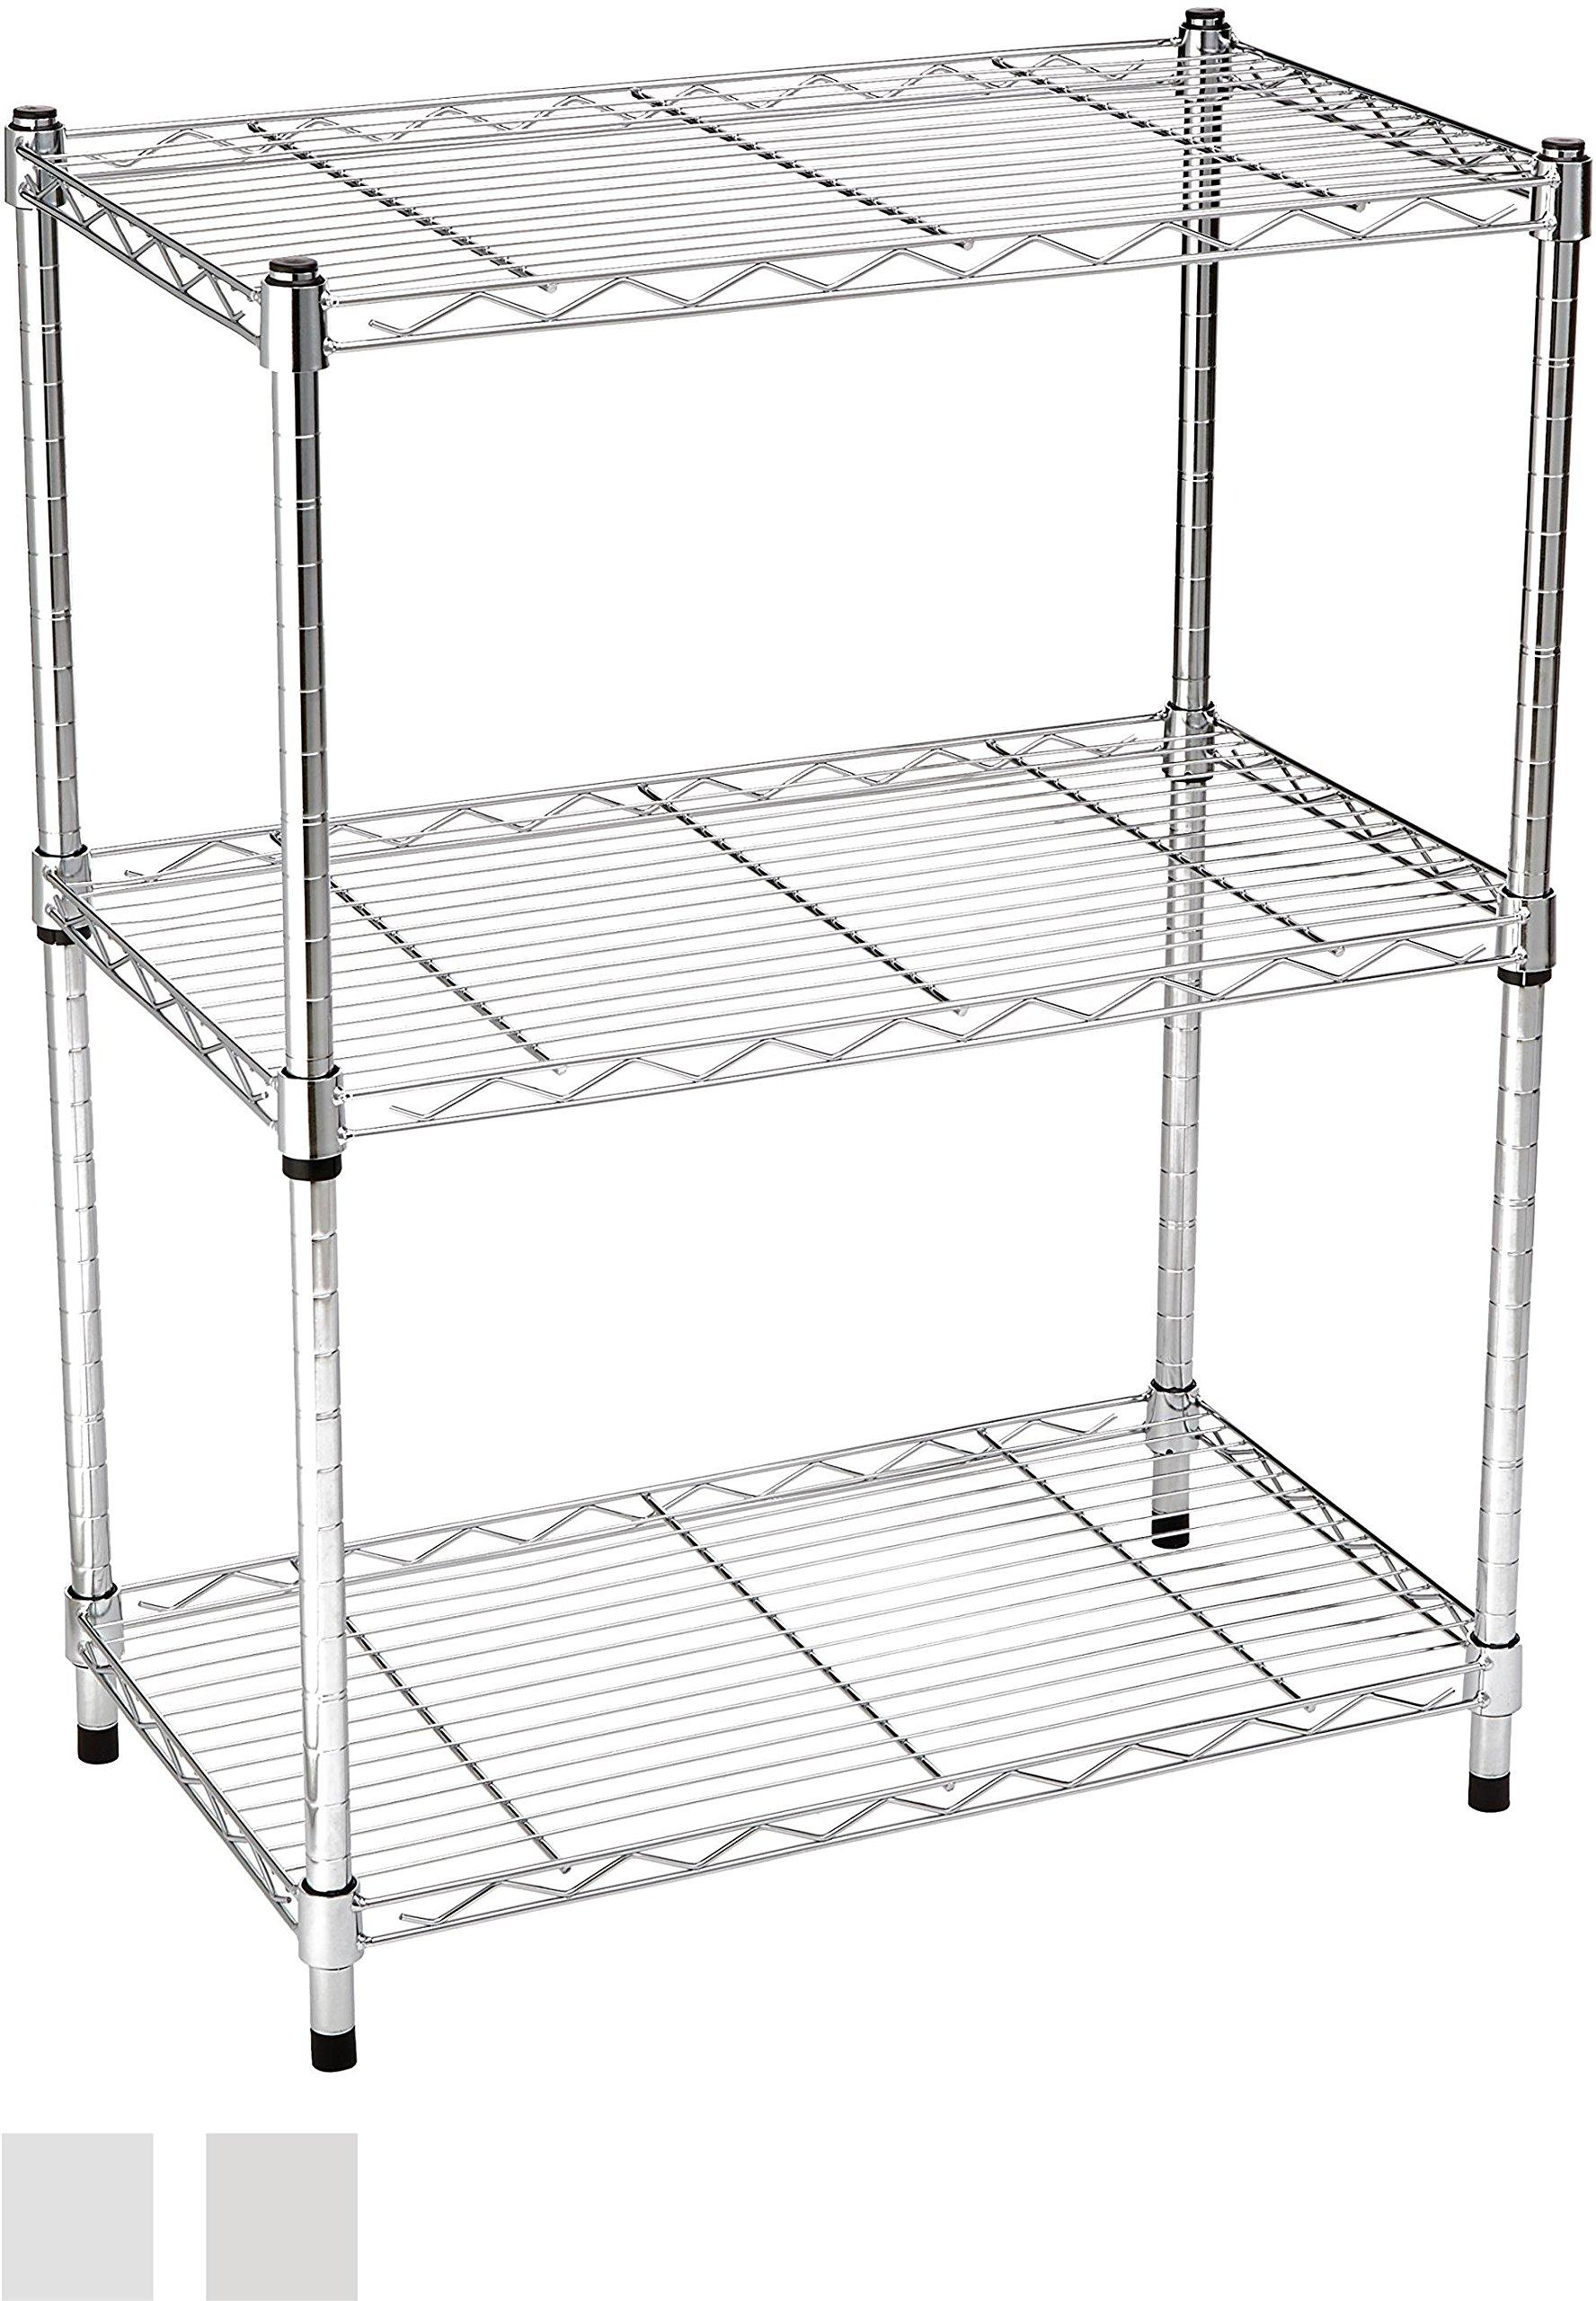 AmazonBasics 5-Shelf Shelving Unit – Black 91JjZizaQLL